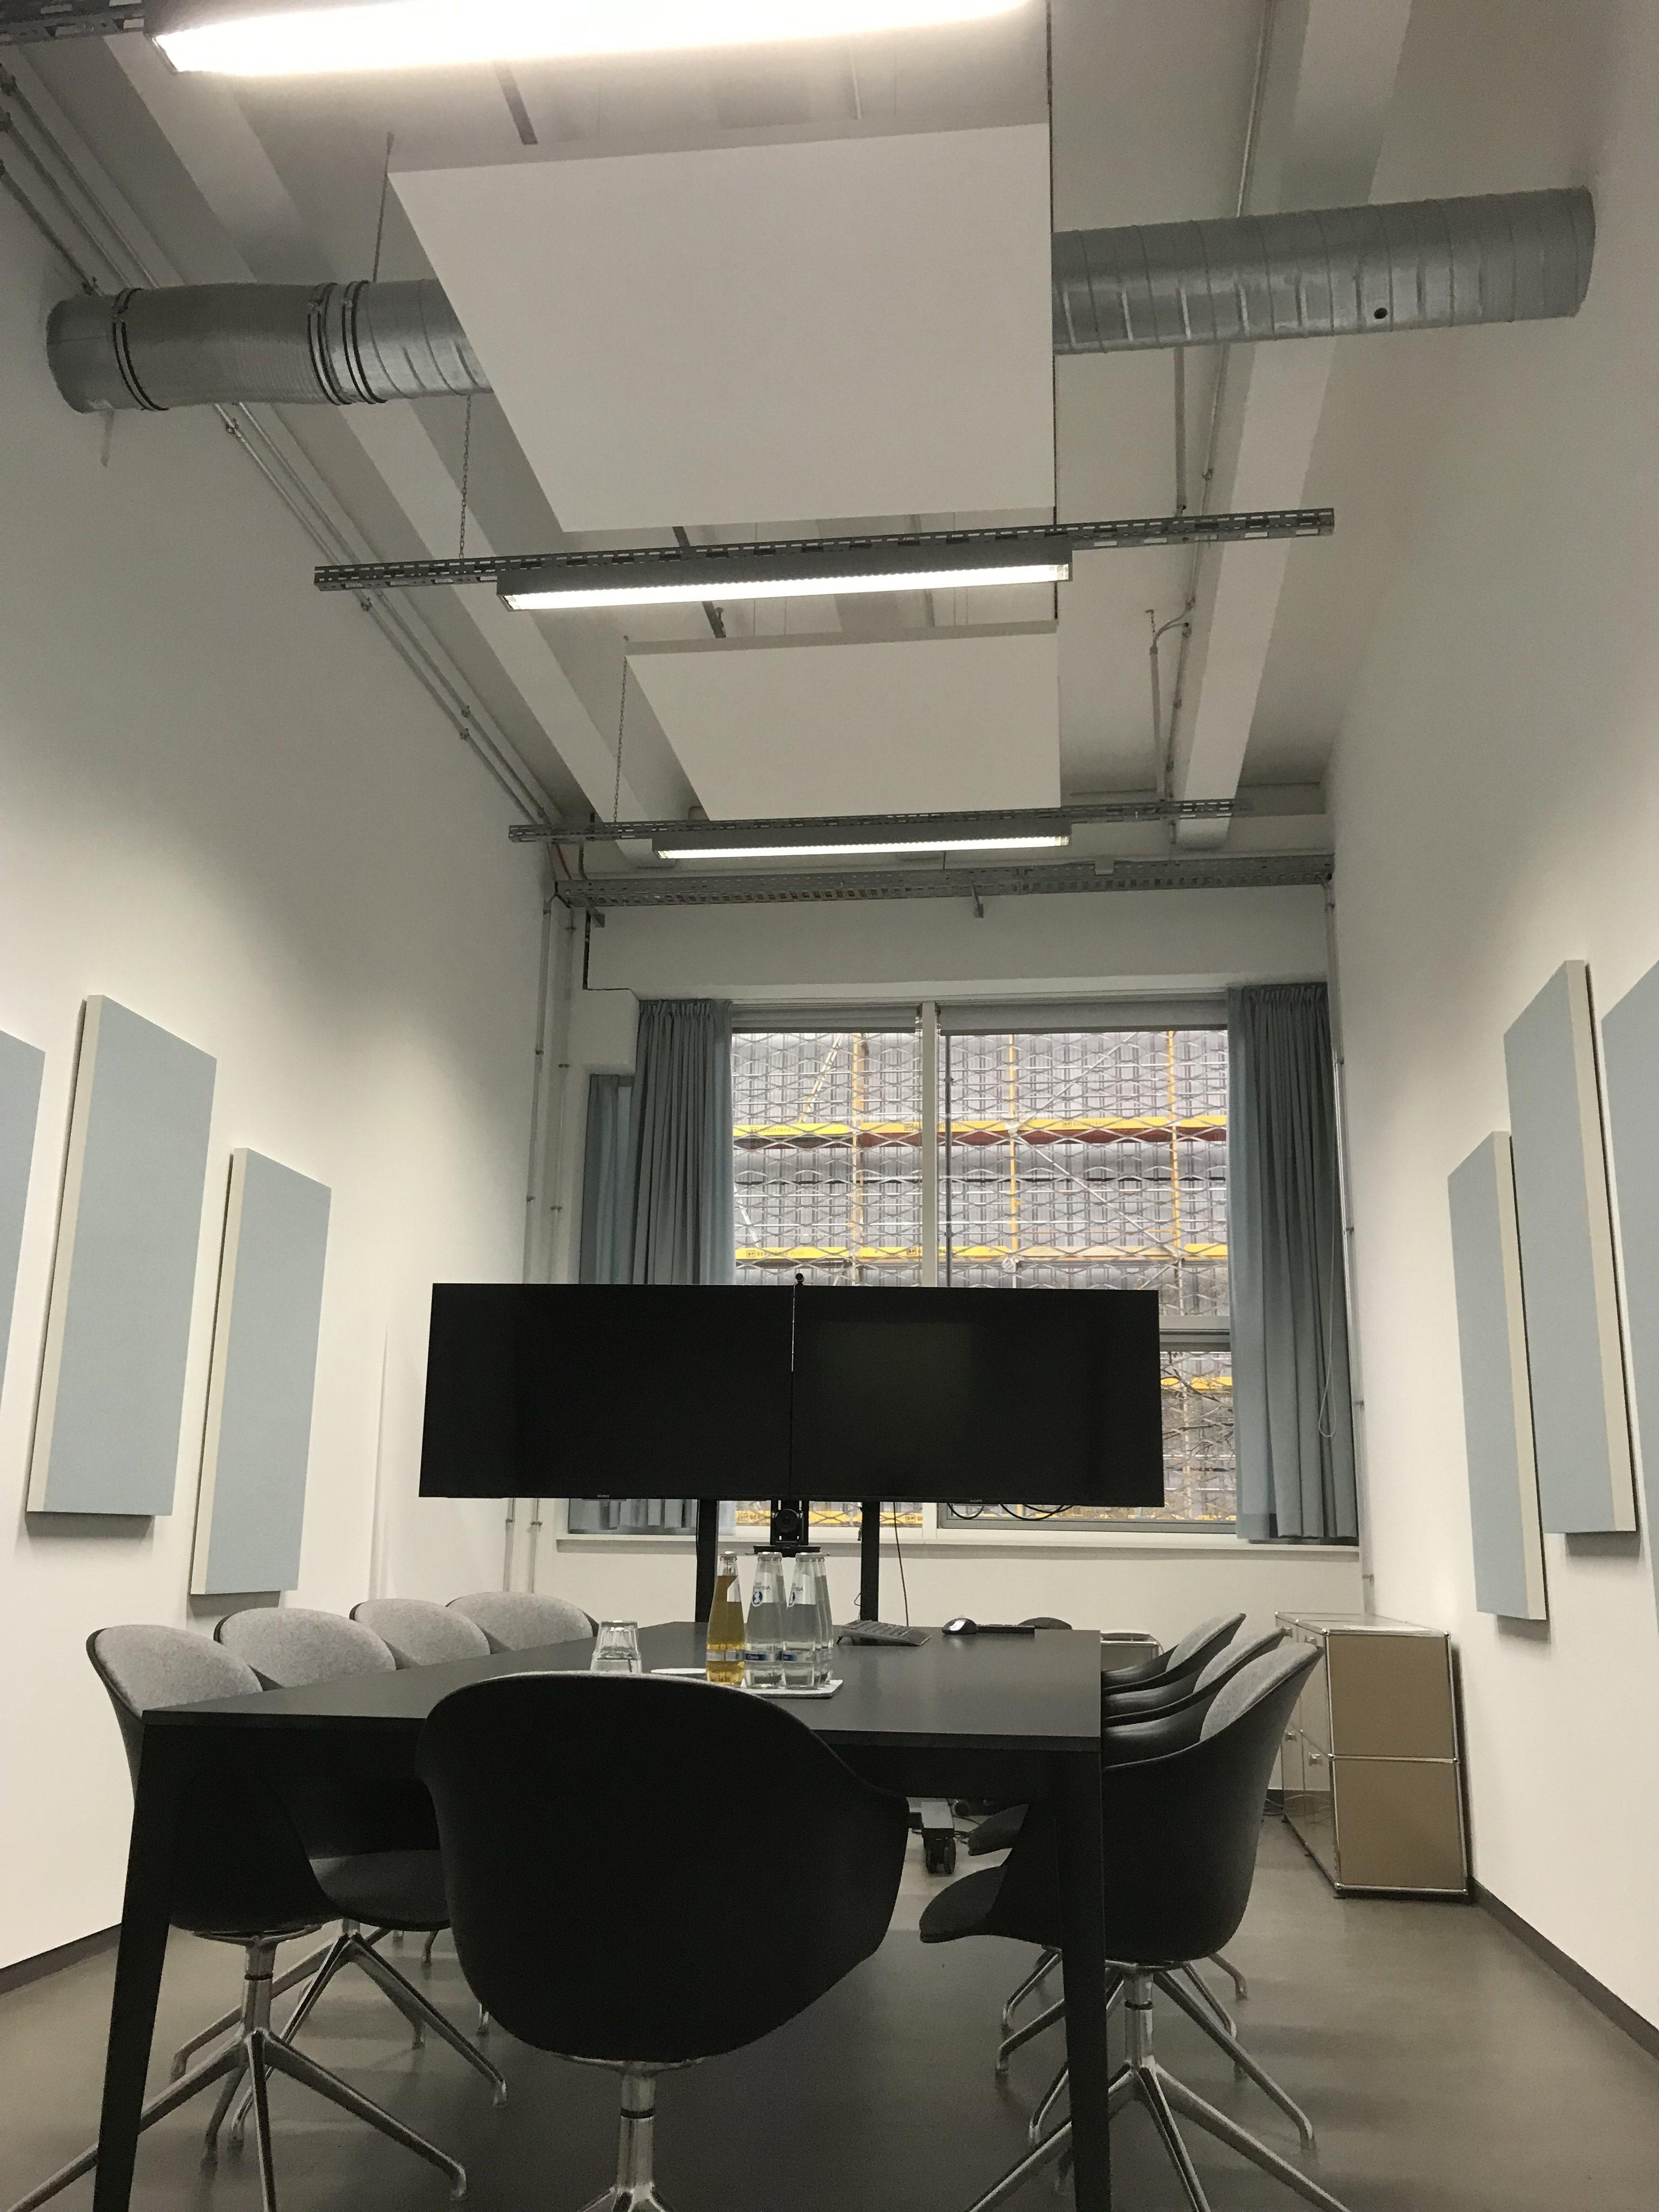 Akustikbau als Generalunternehmen